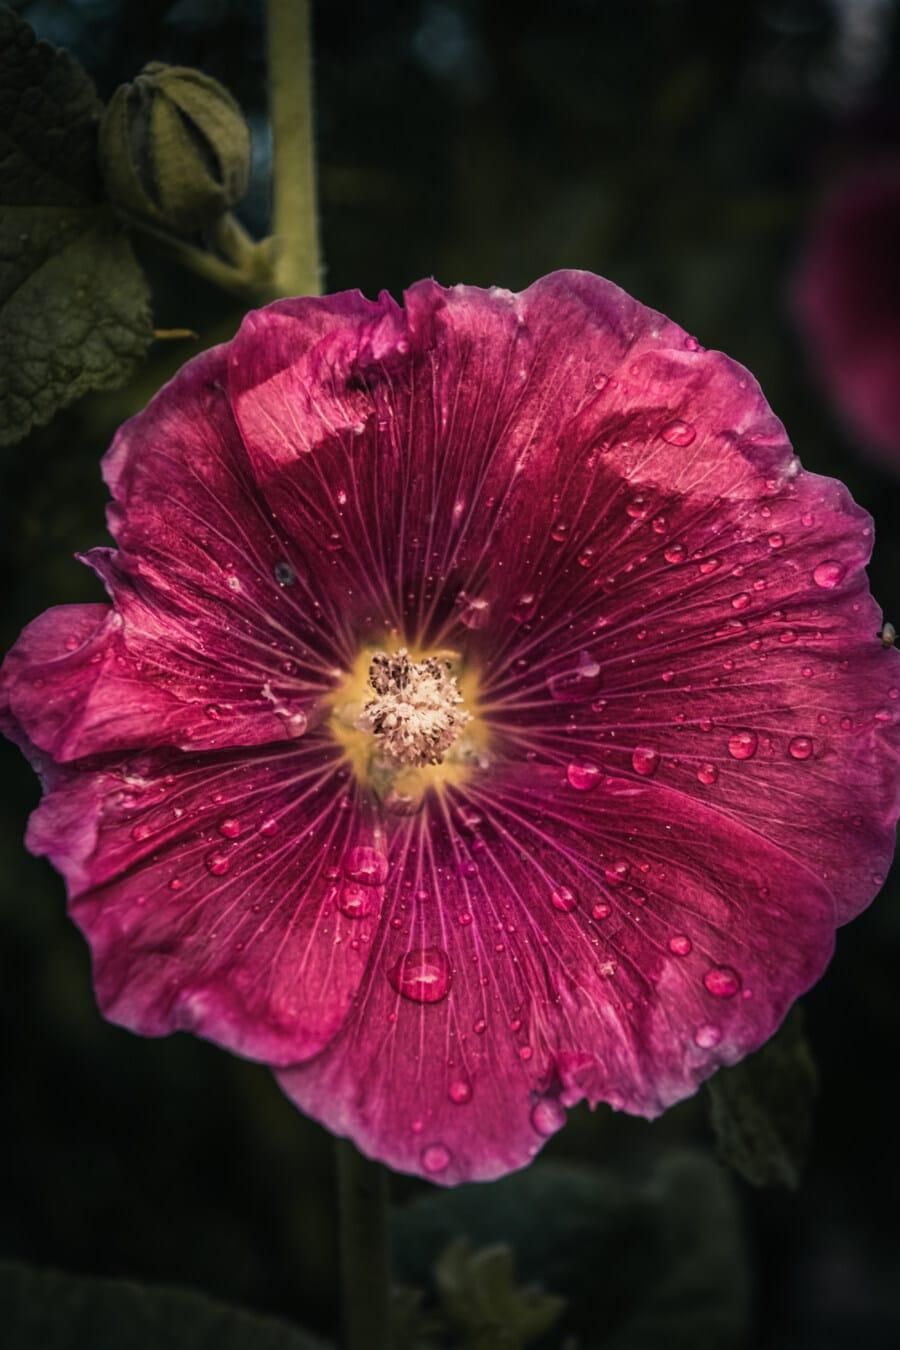 Blume, lila, Rosa, nass, Regentropfen, Regen, aus nächster Nähe, Stempel, Pollen, Natur